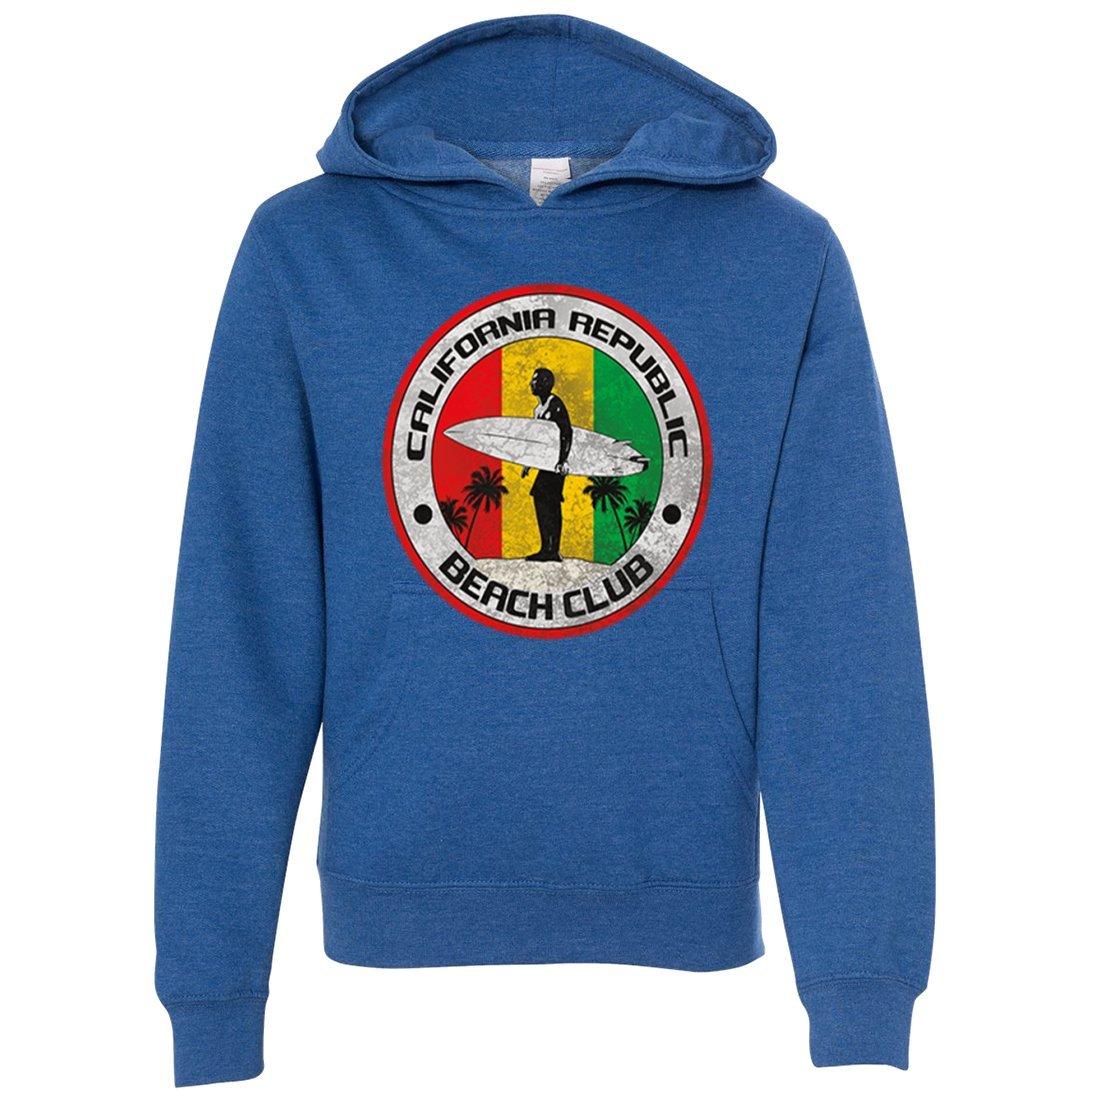 California Republic Beach Club Premium Youth Sweatshirt Hoodie